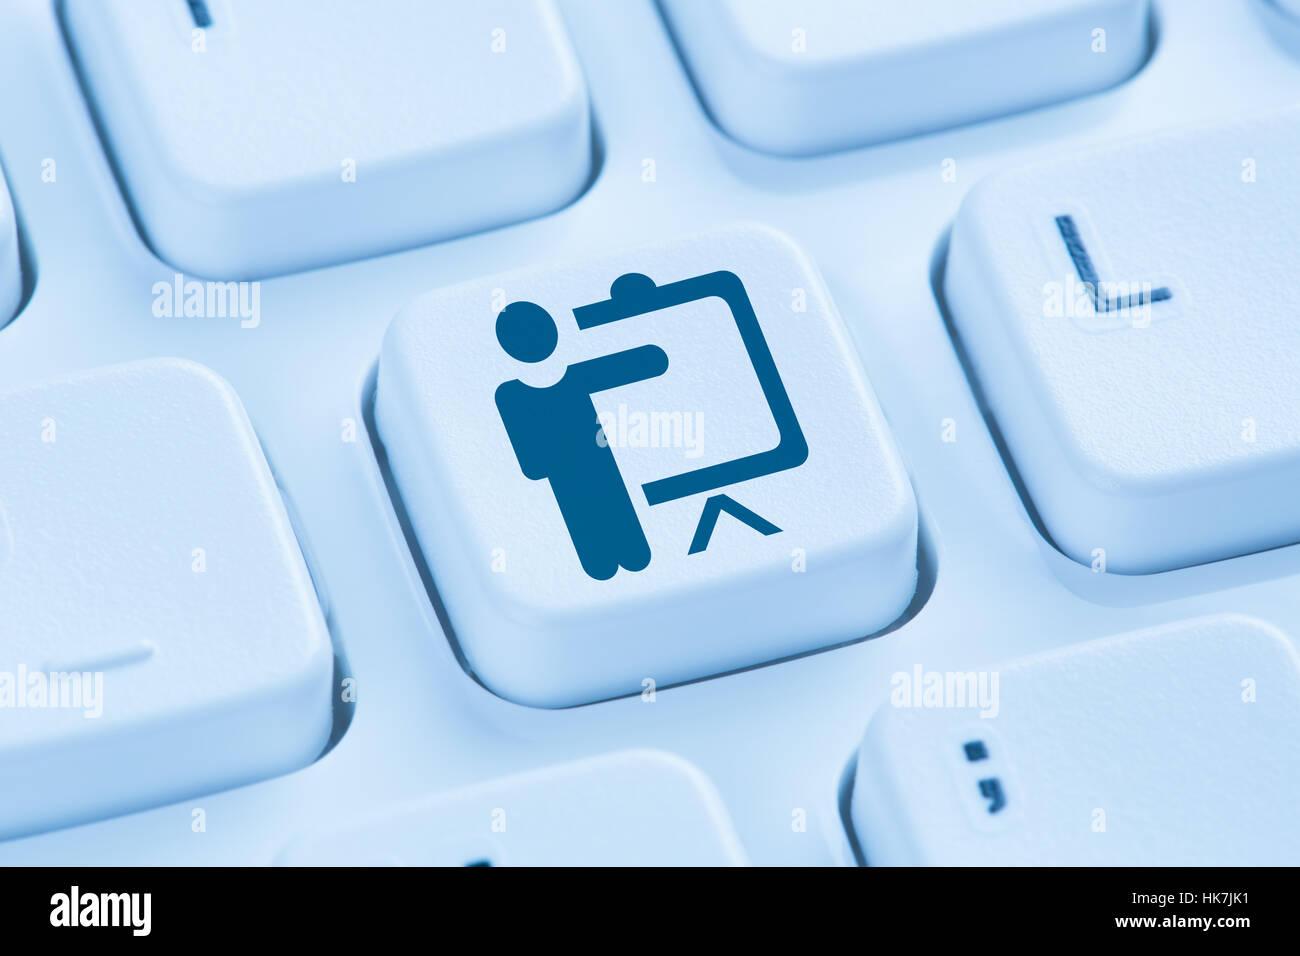 Formación coaching educativo taller de aprendizaje online internet símbolo azul teclado de ordenador Imagen De Stock